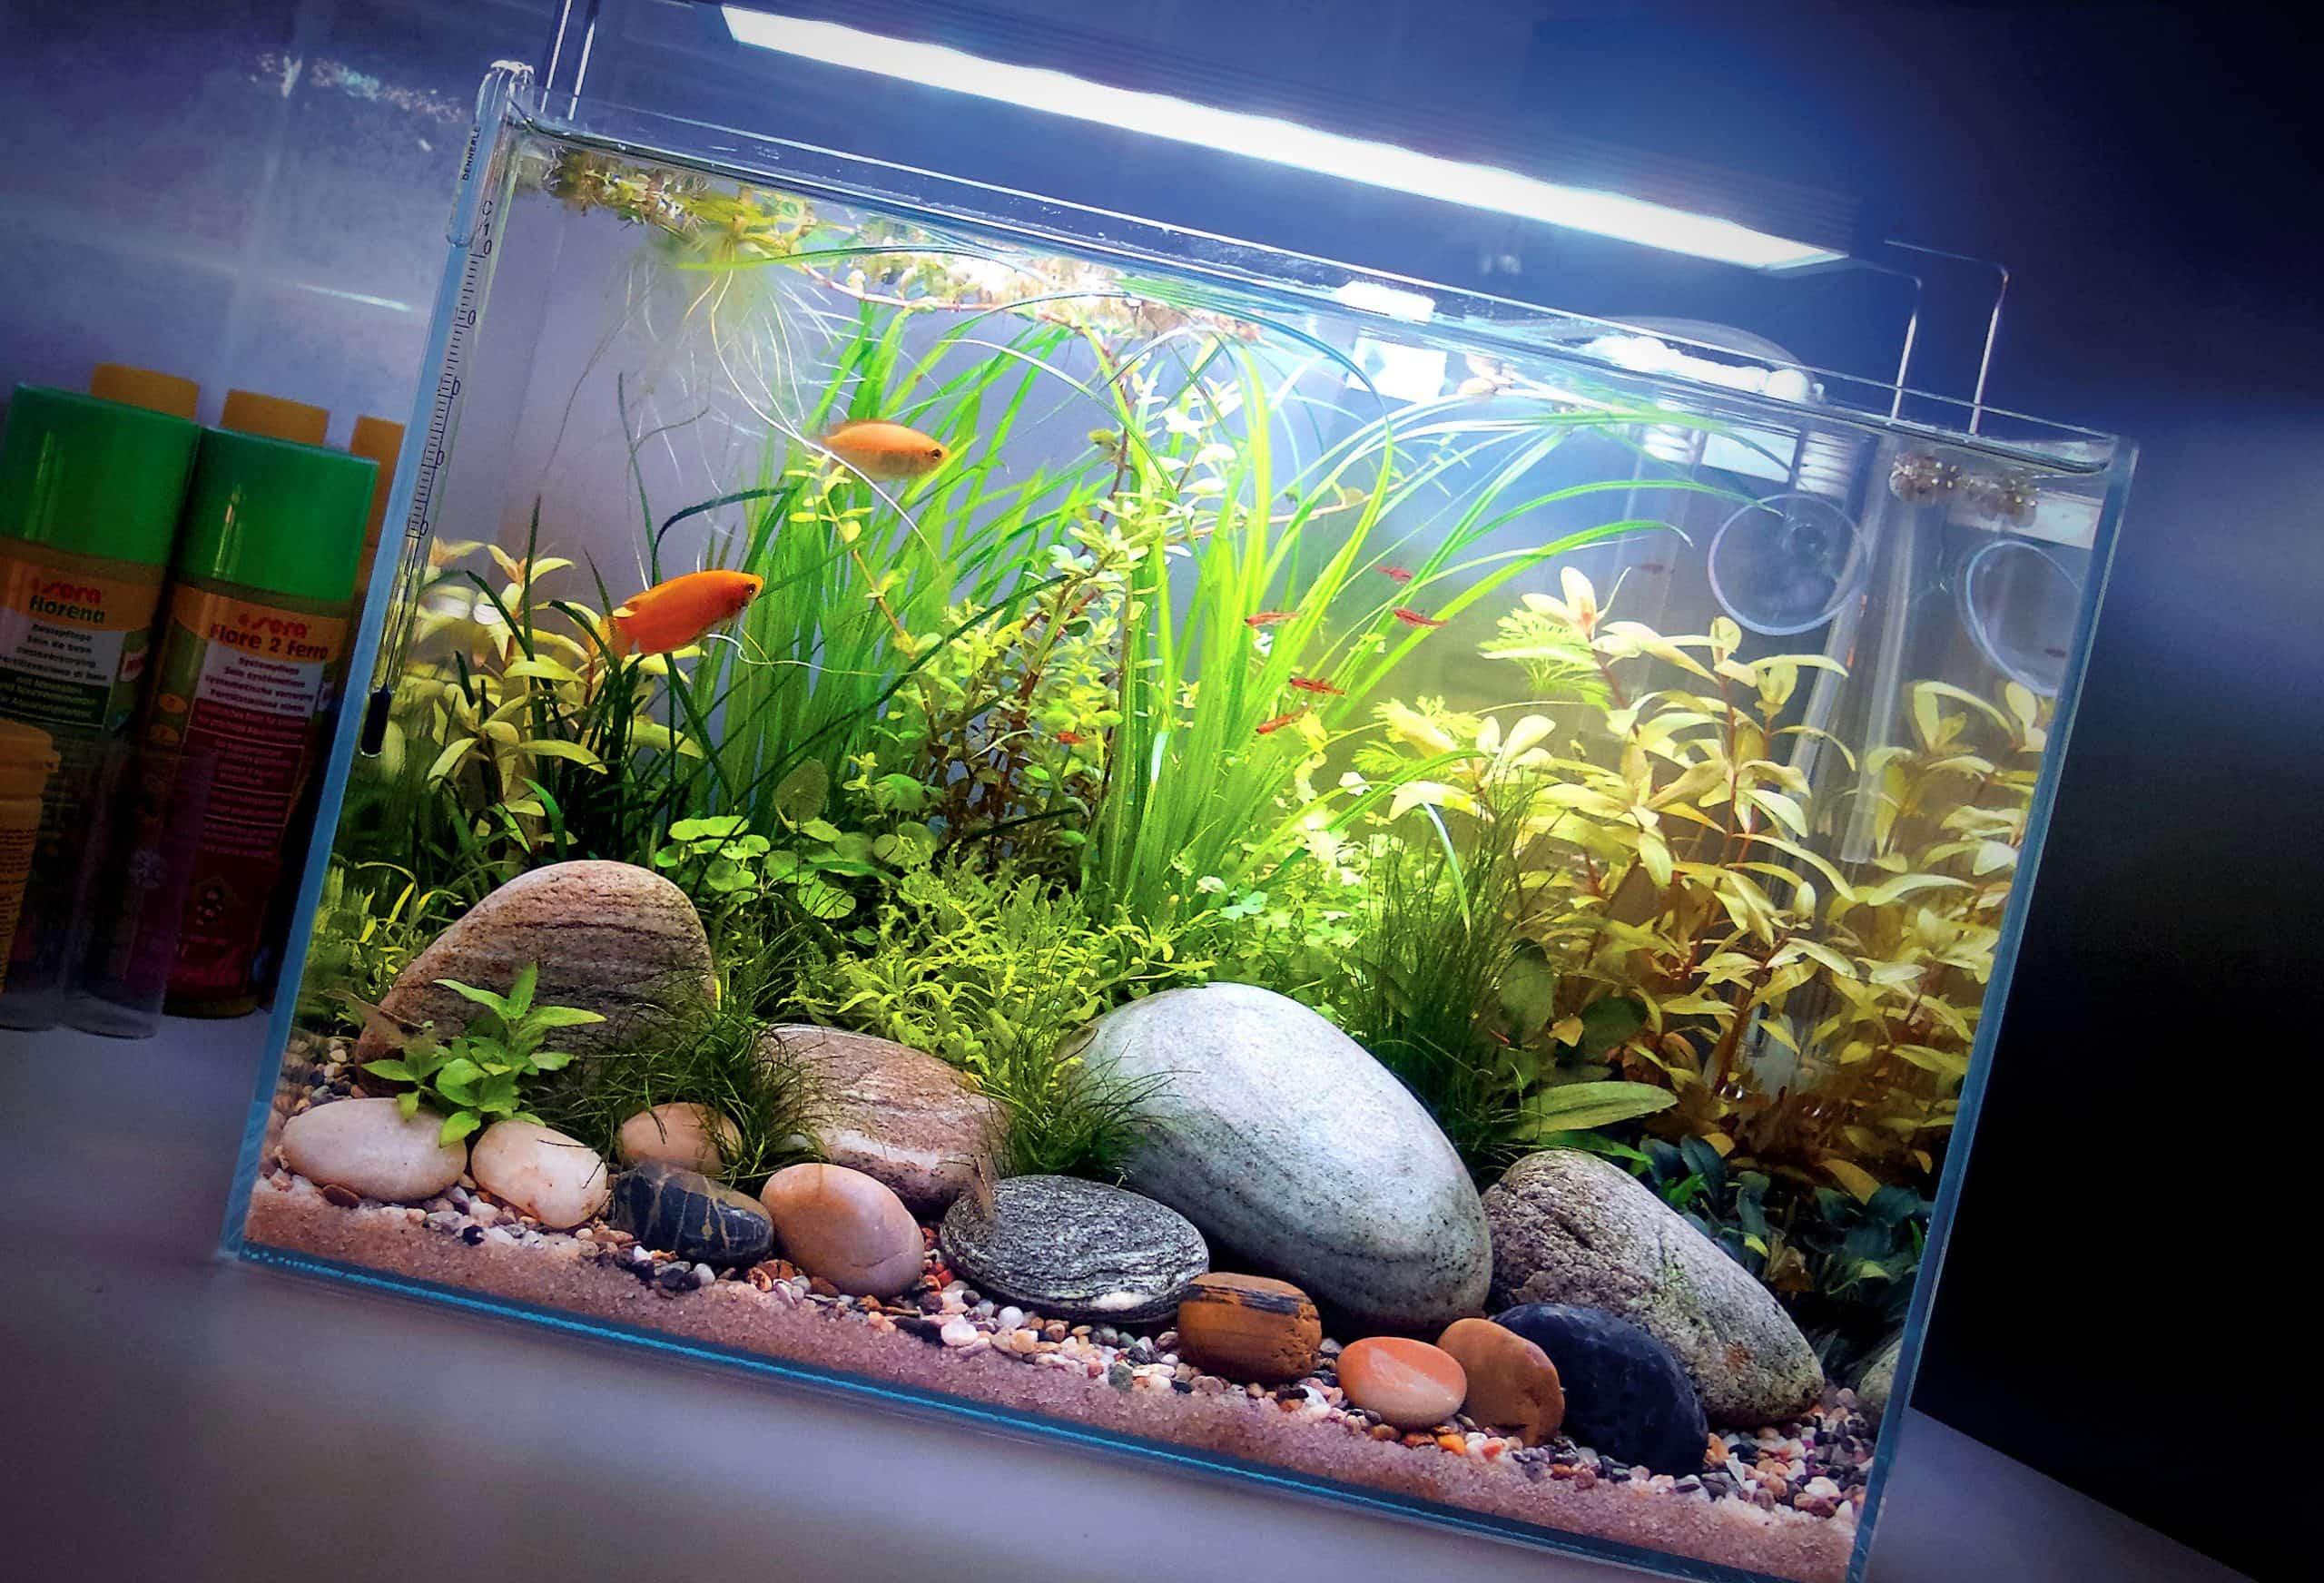 Pesci di acqua dolce tropicali: Anabantidi